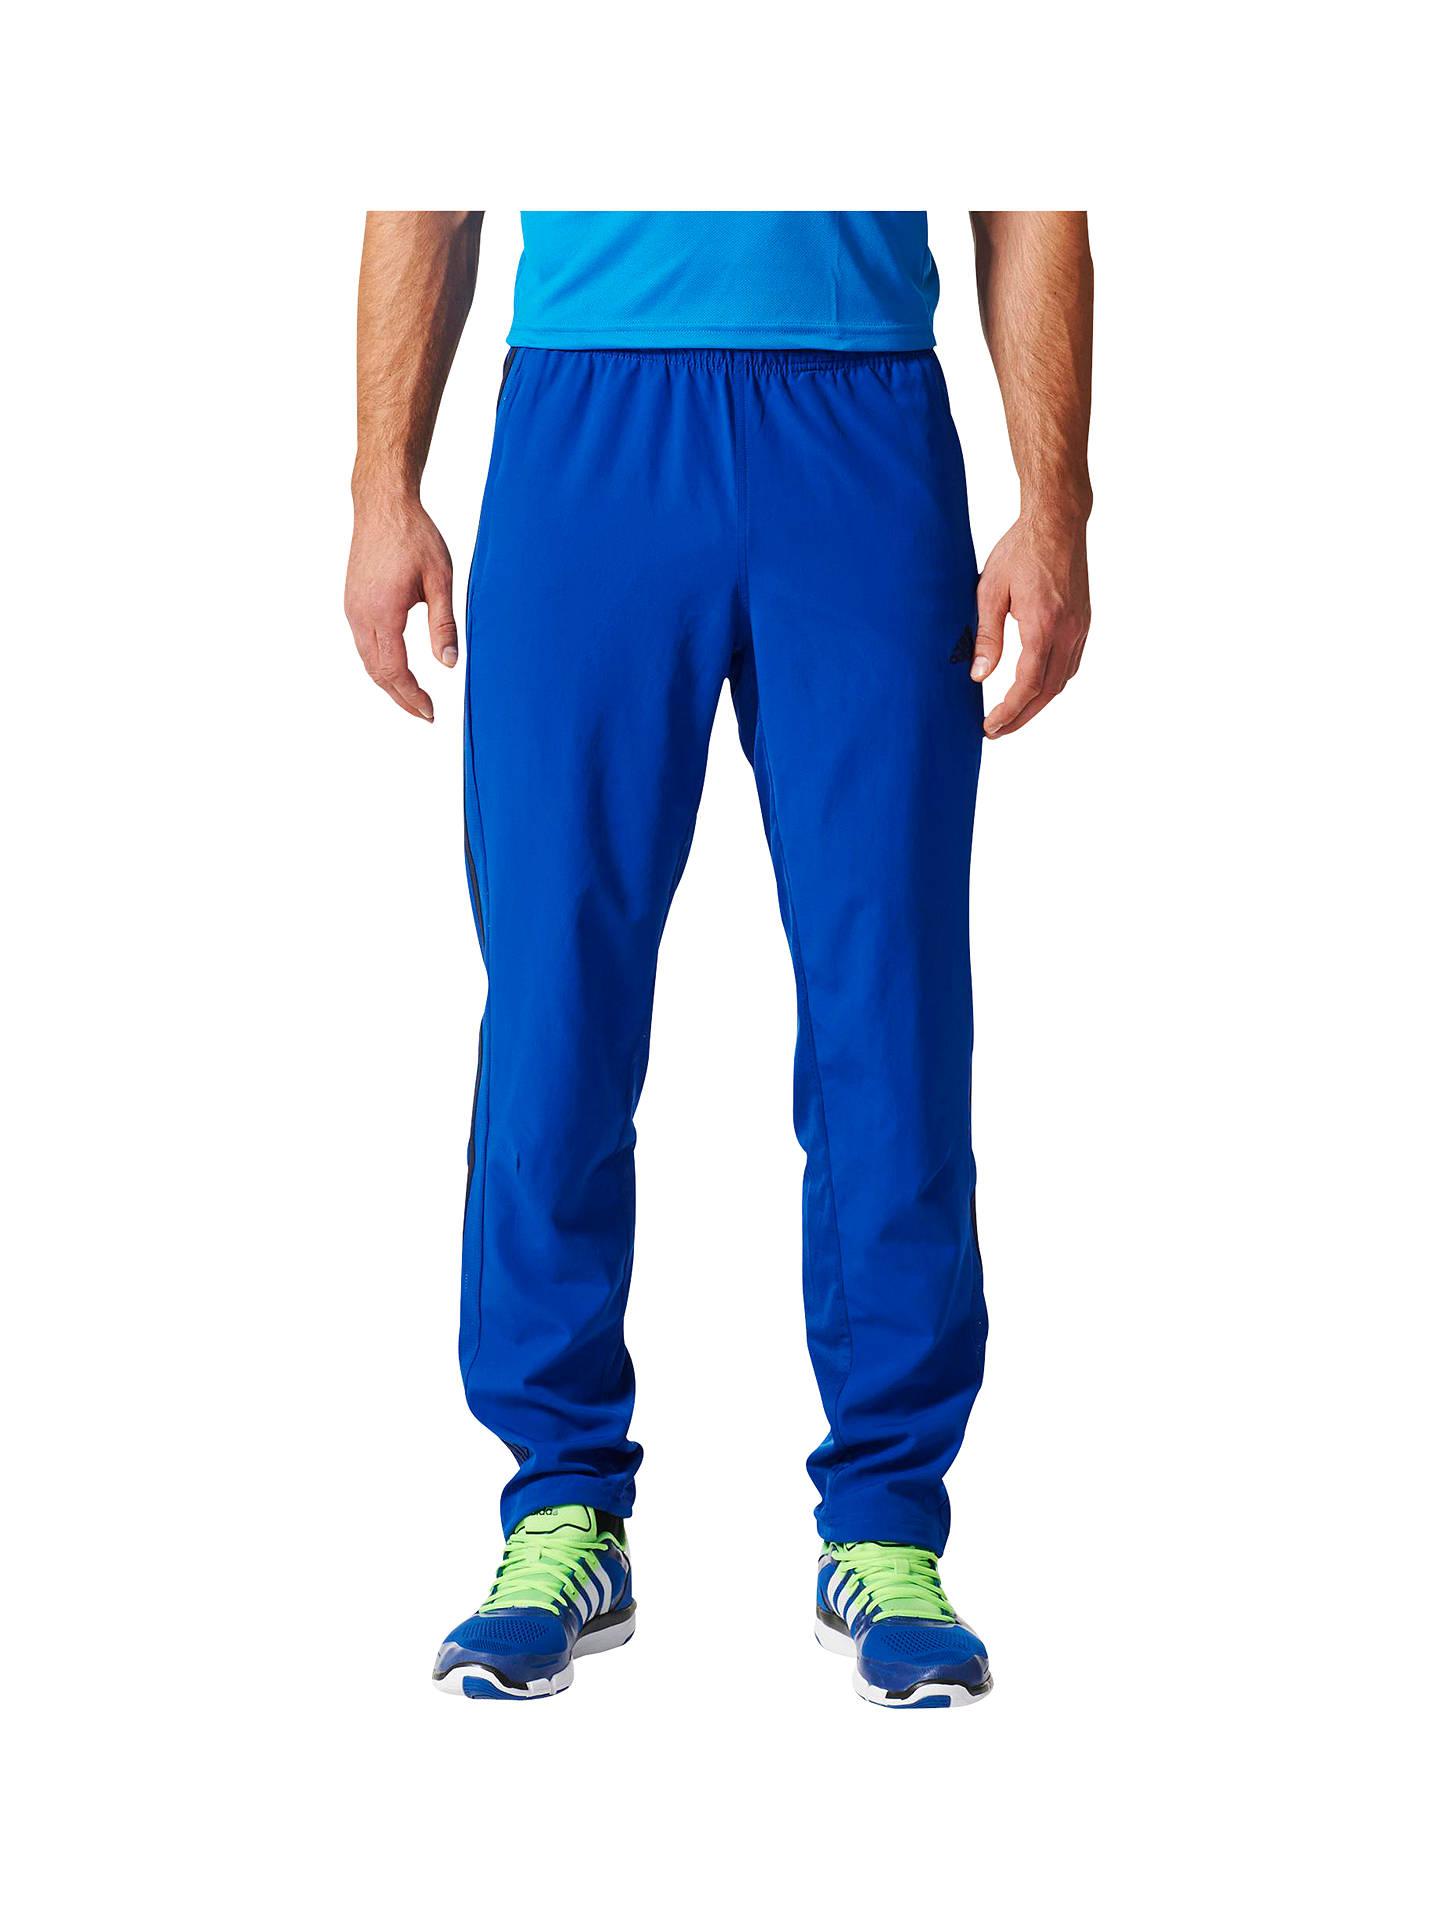 Adidas Cool365 Training Pants at John Lewis & Partners